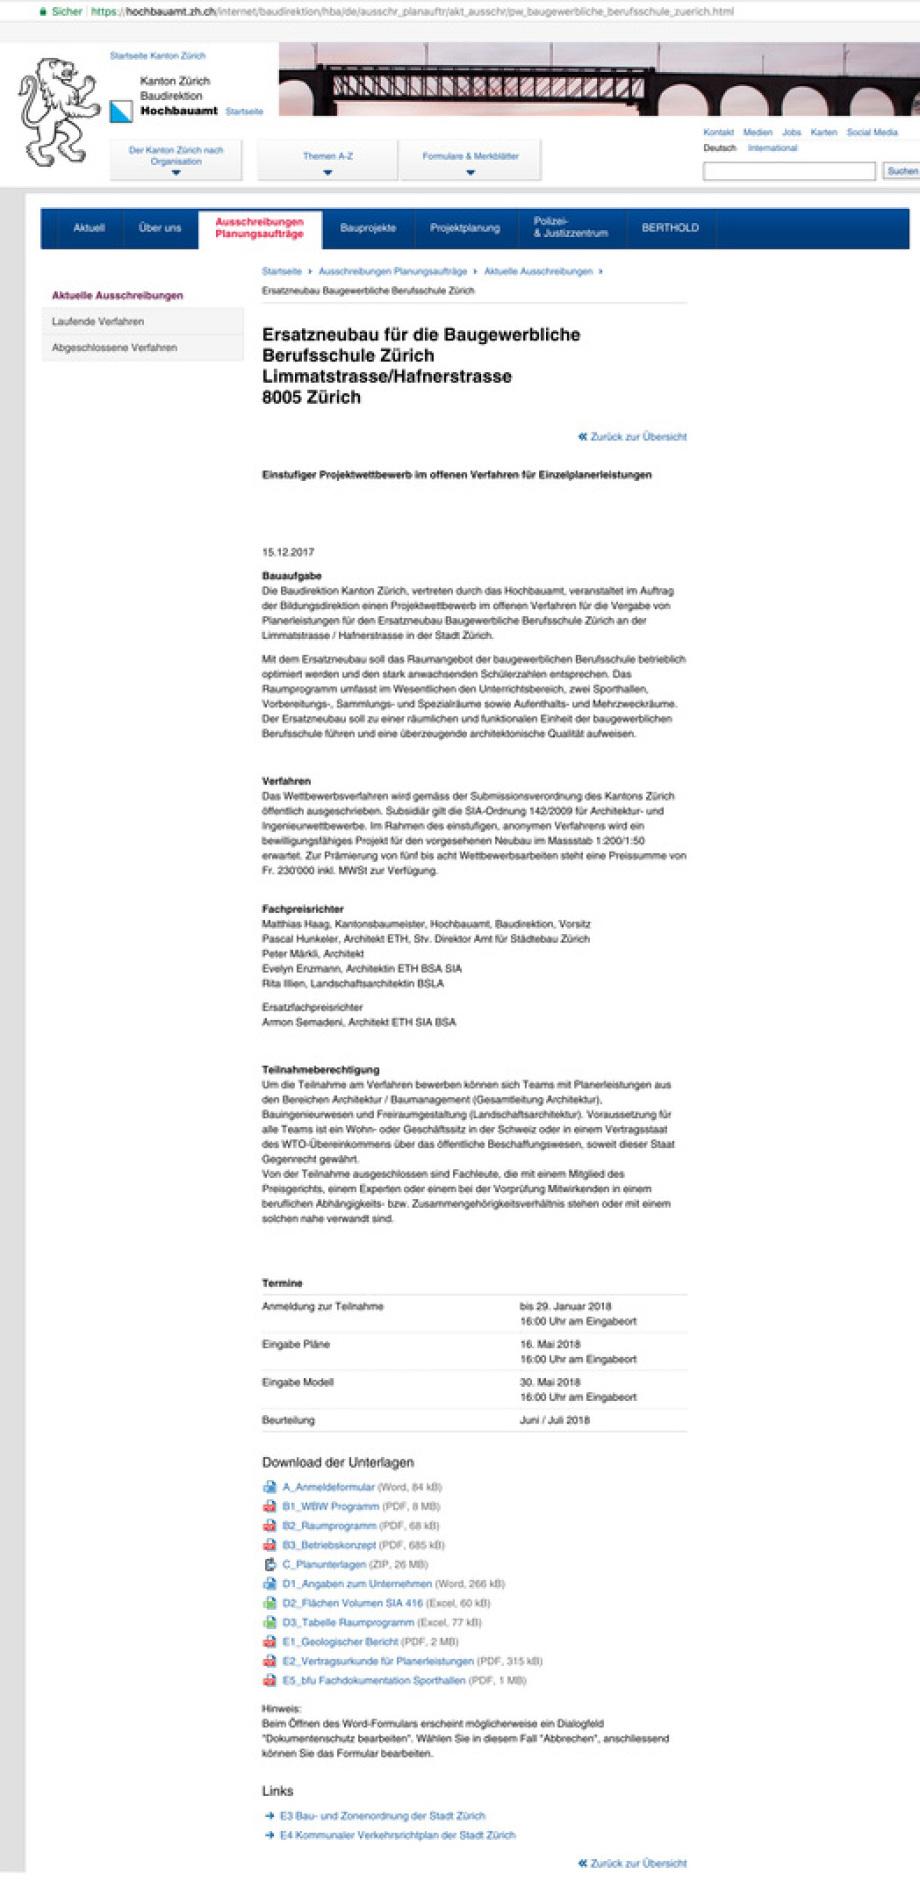 01_Publikation_Wettbewerb_BBZ_HBA_ZH_Neubau_Berufsschule_Limmatstrasse